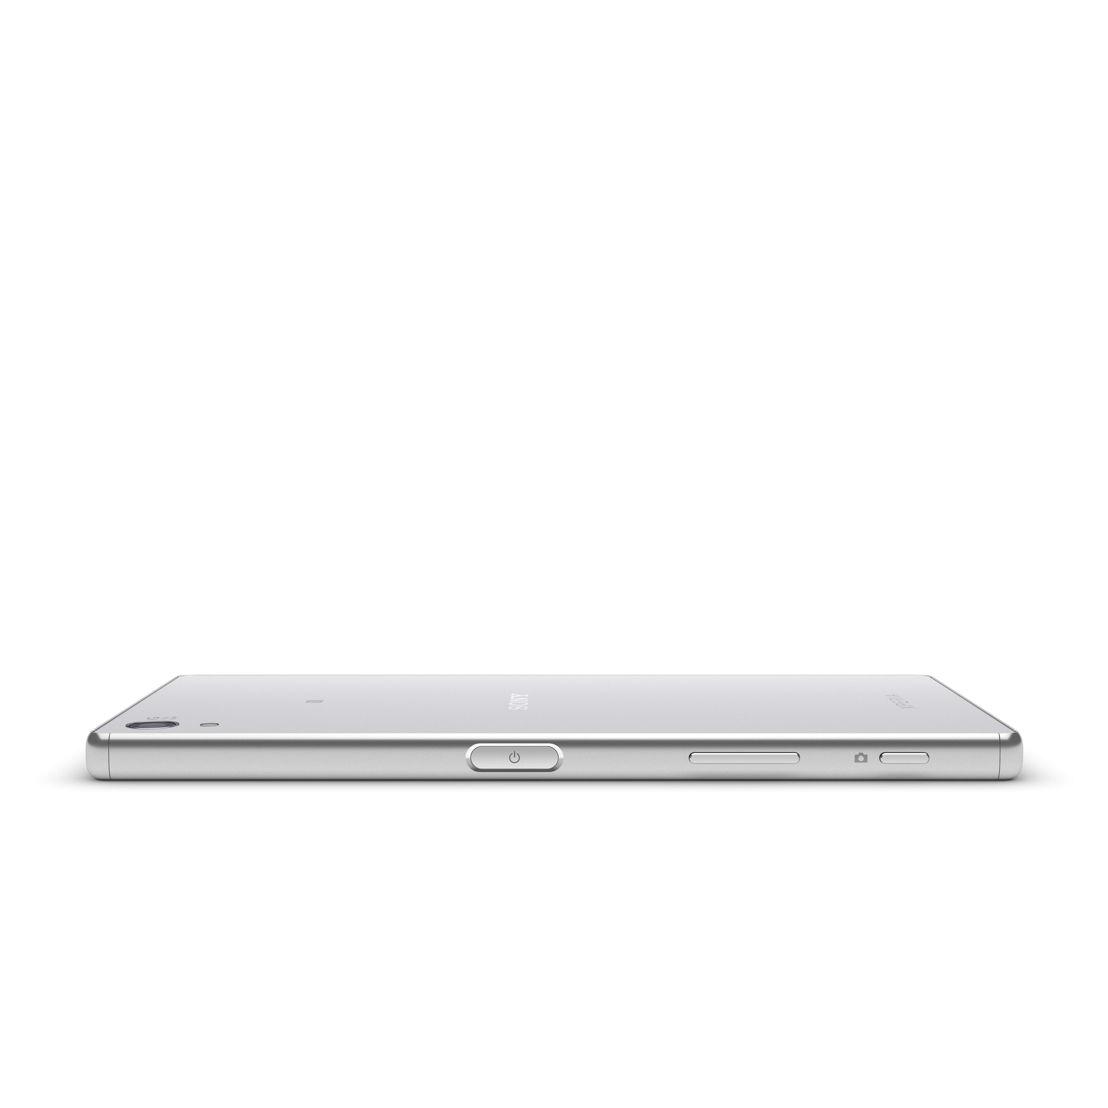 Z5 Premium Chrome